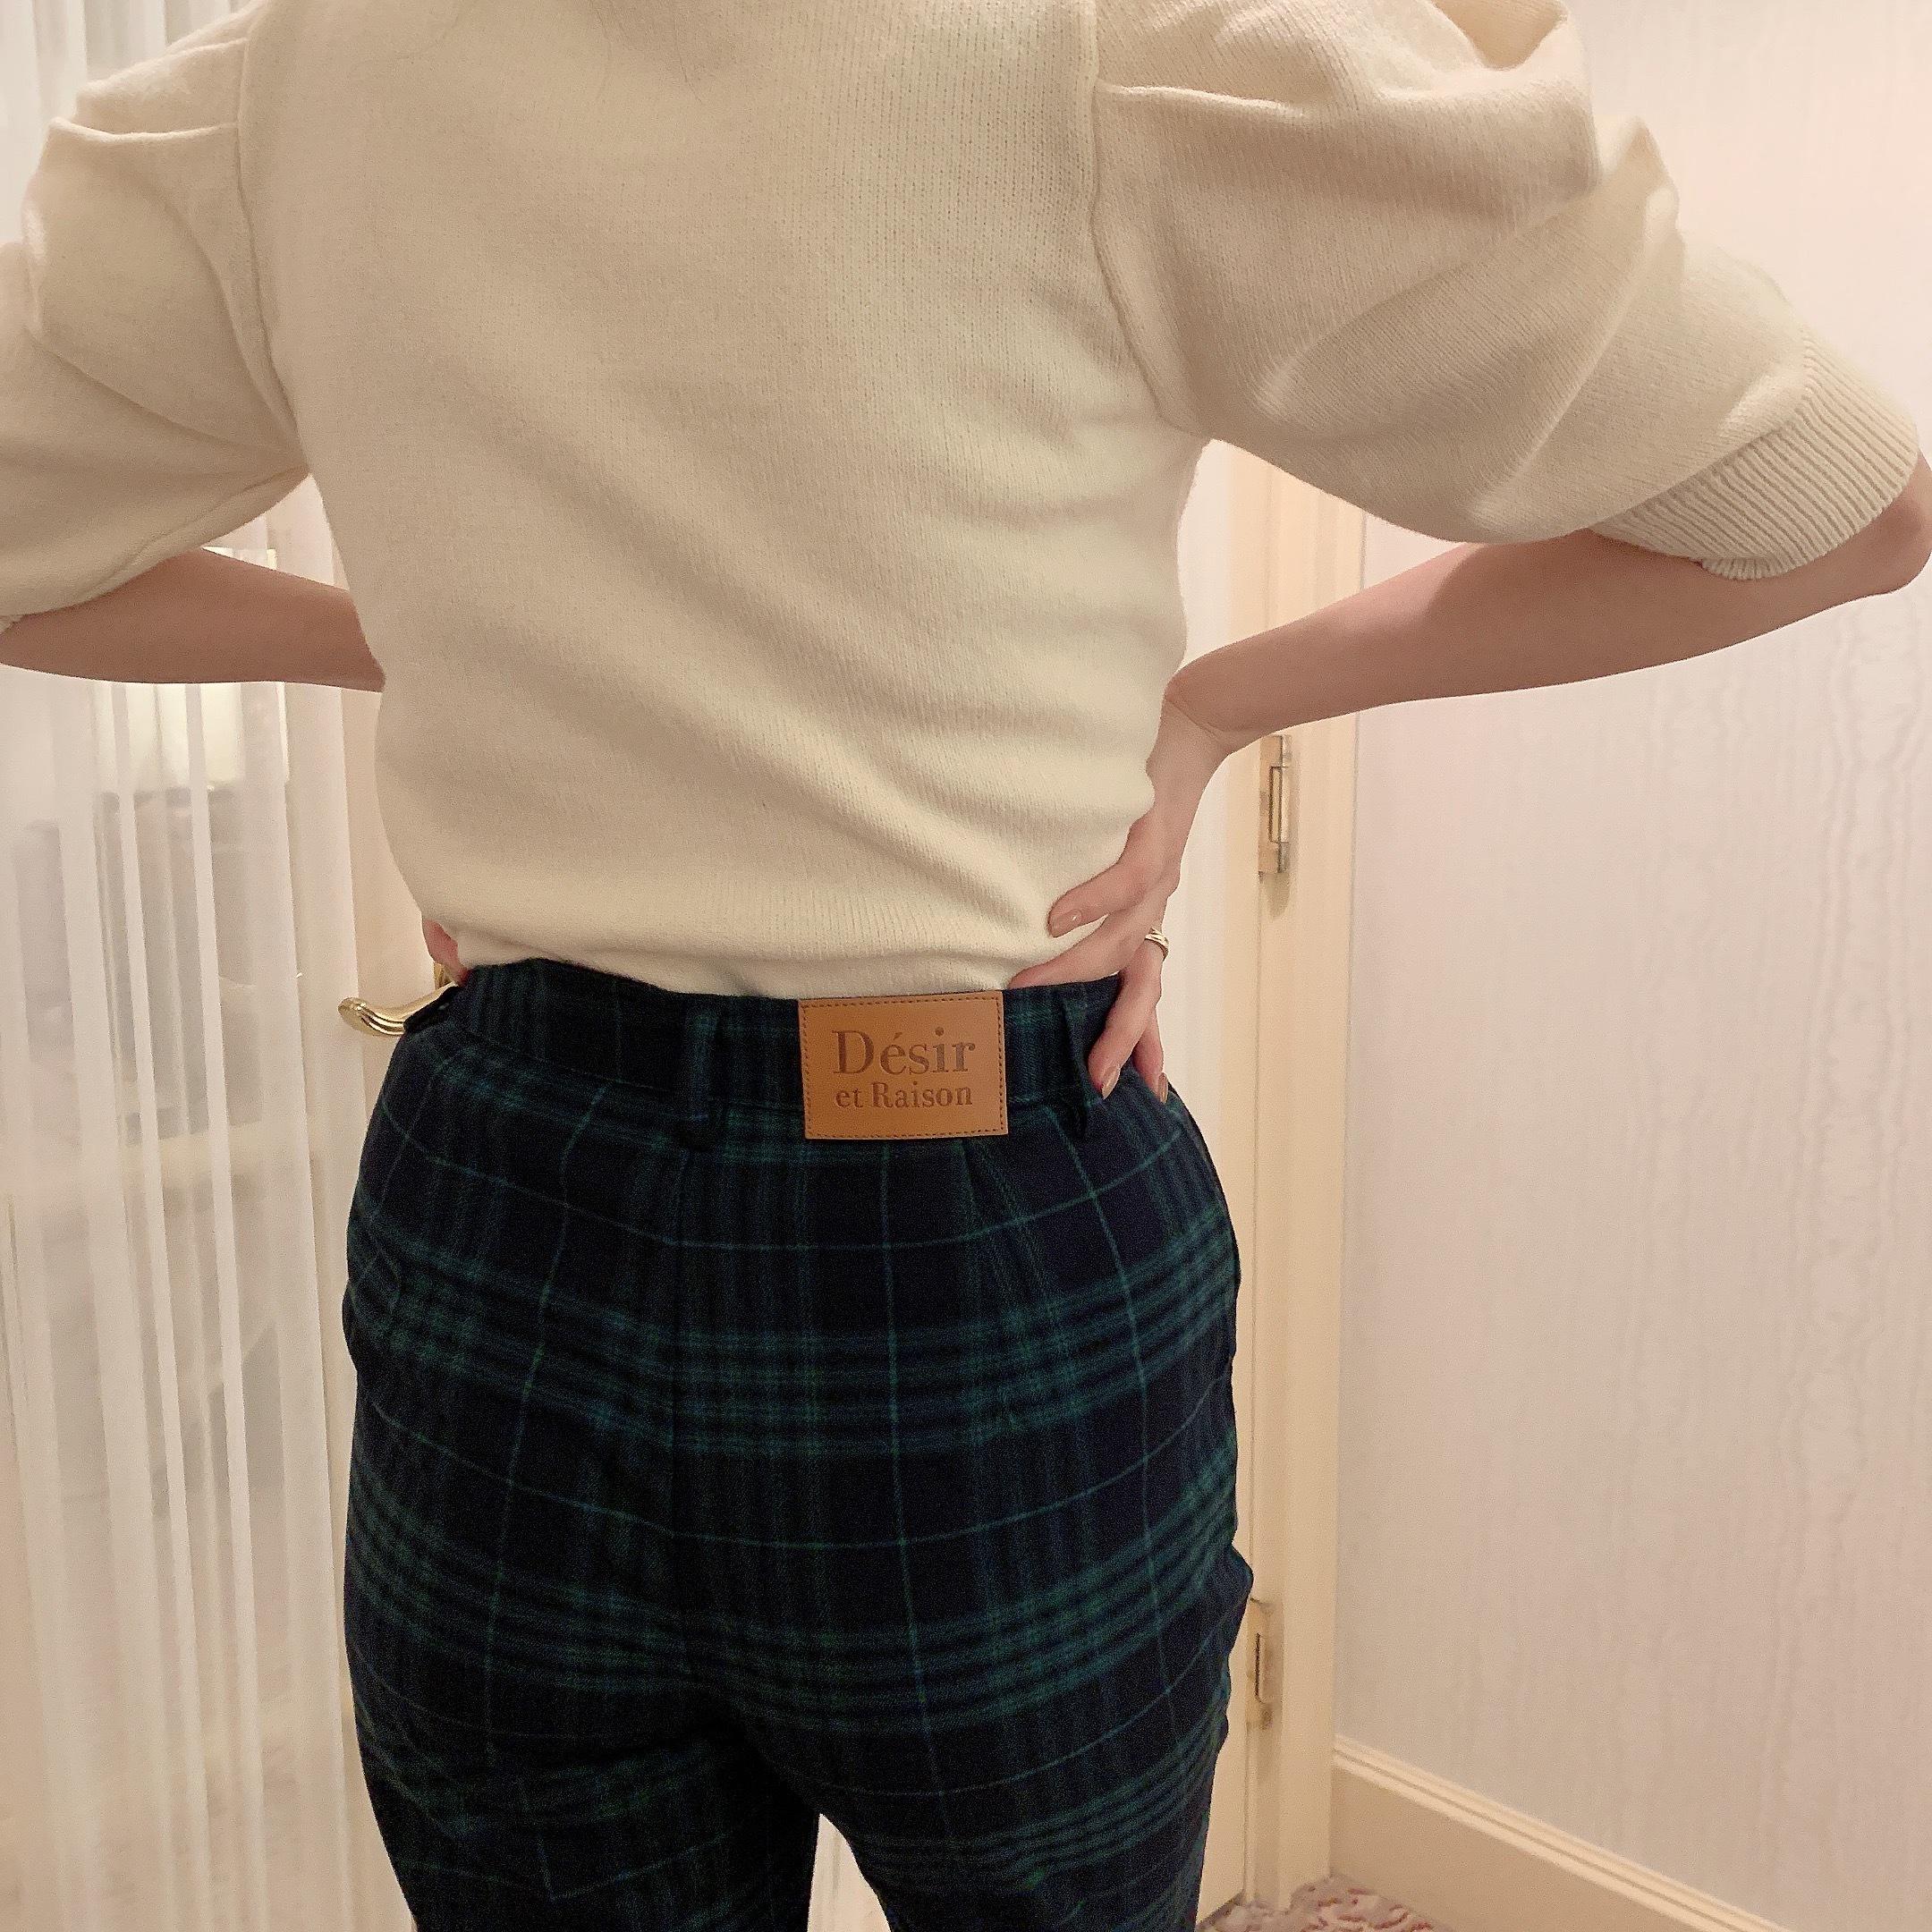 【Désir original】London check pants